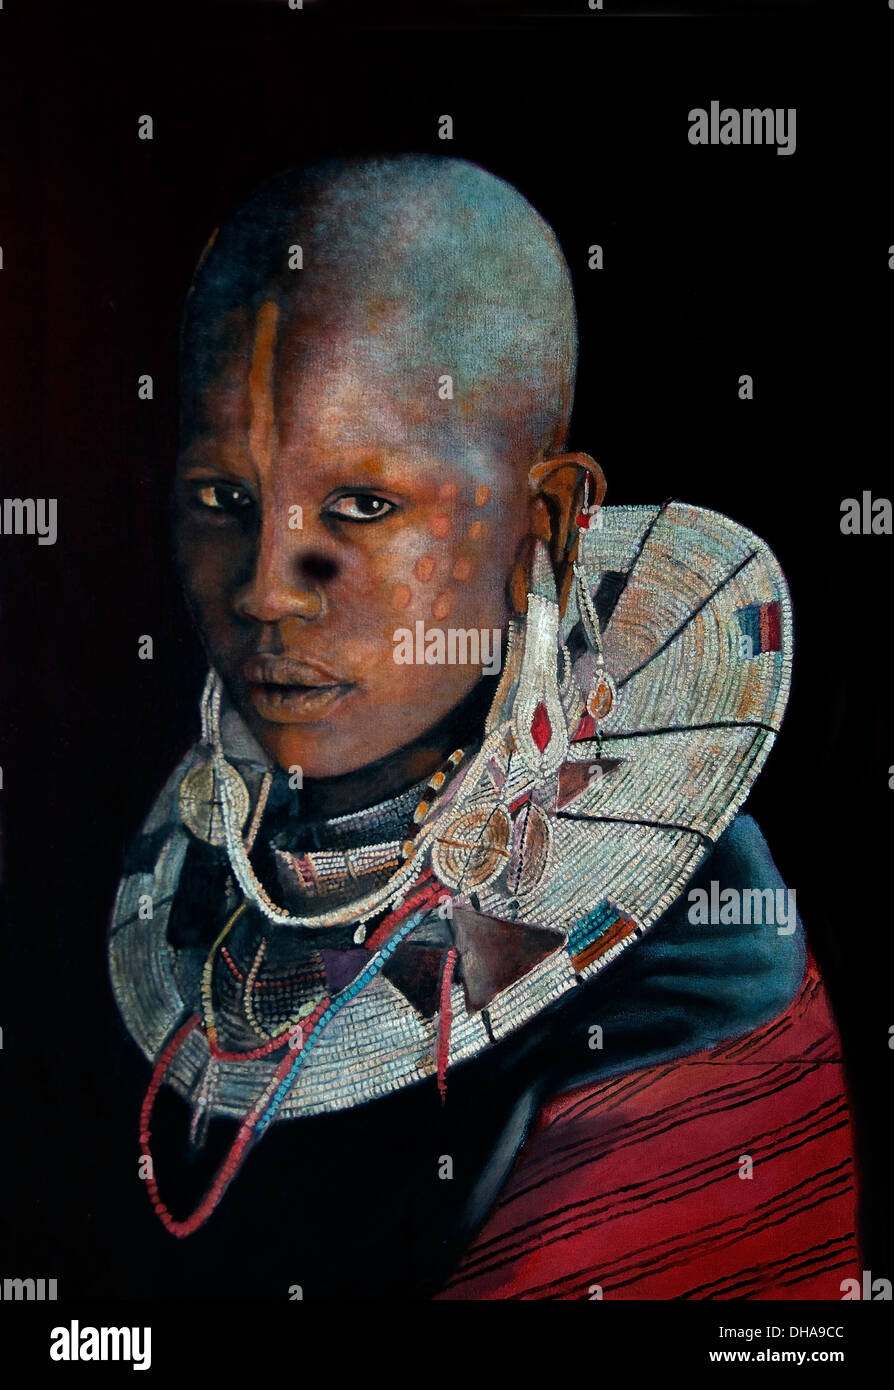 Modern Art Gallery Painting woman Kenya Tanzania Africa African - Stock Image